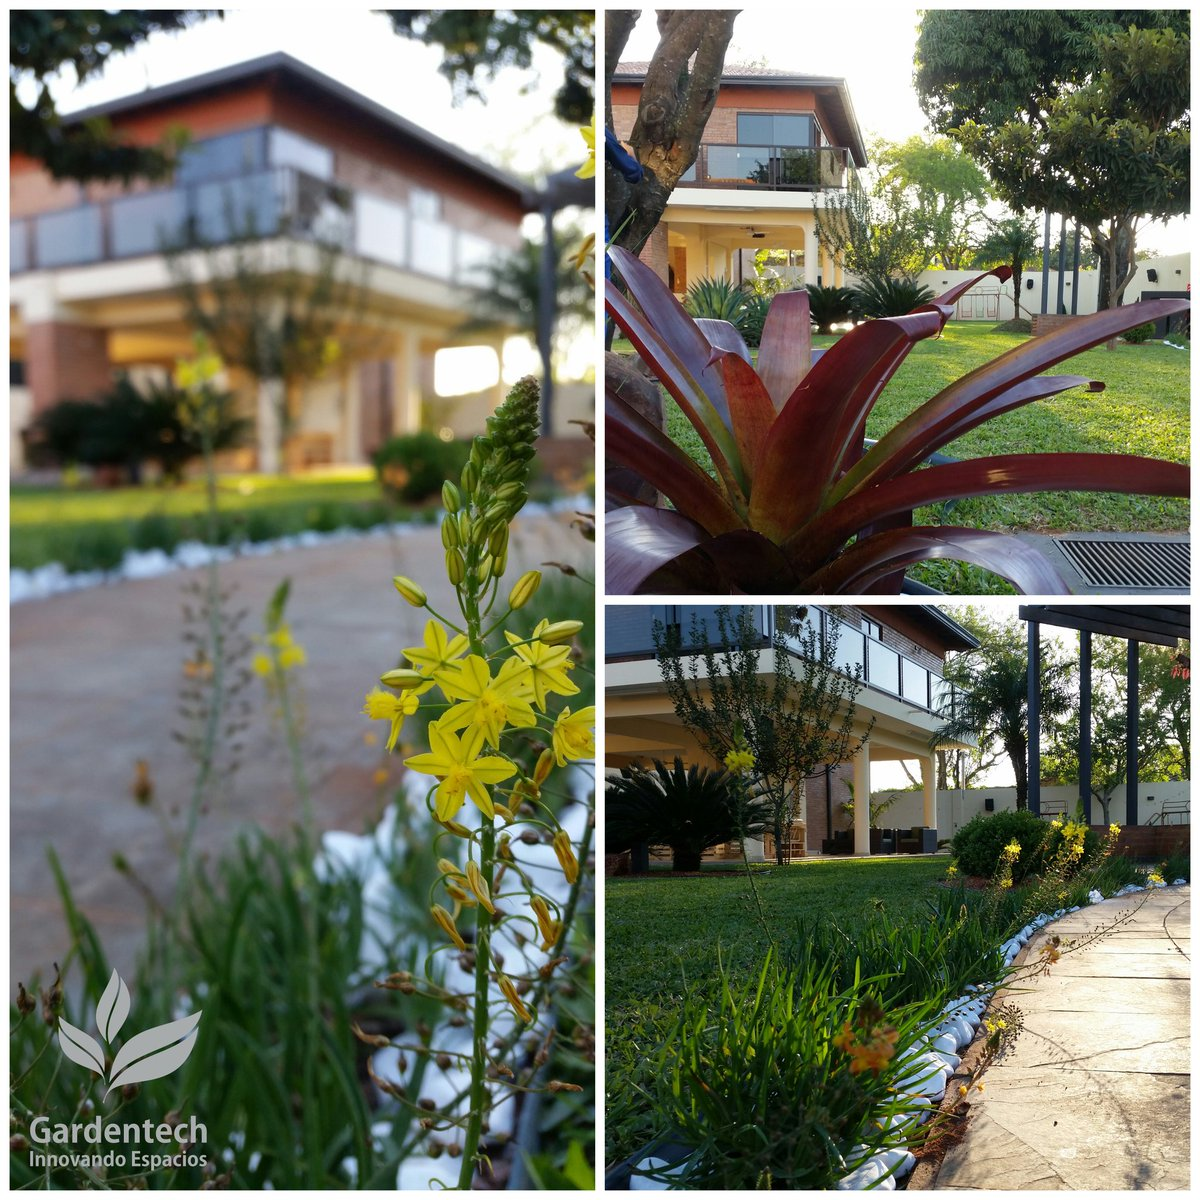 Gardentech On Twitter Caminero Con Bulbines Cycas Bromelias